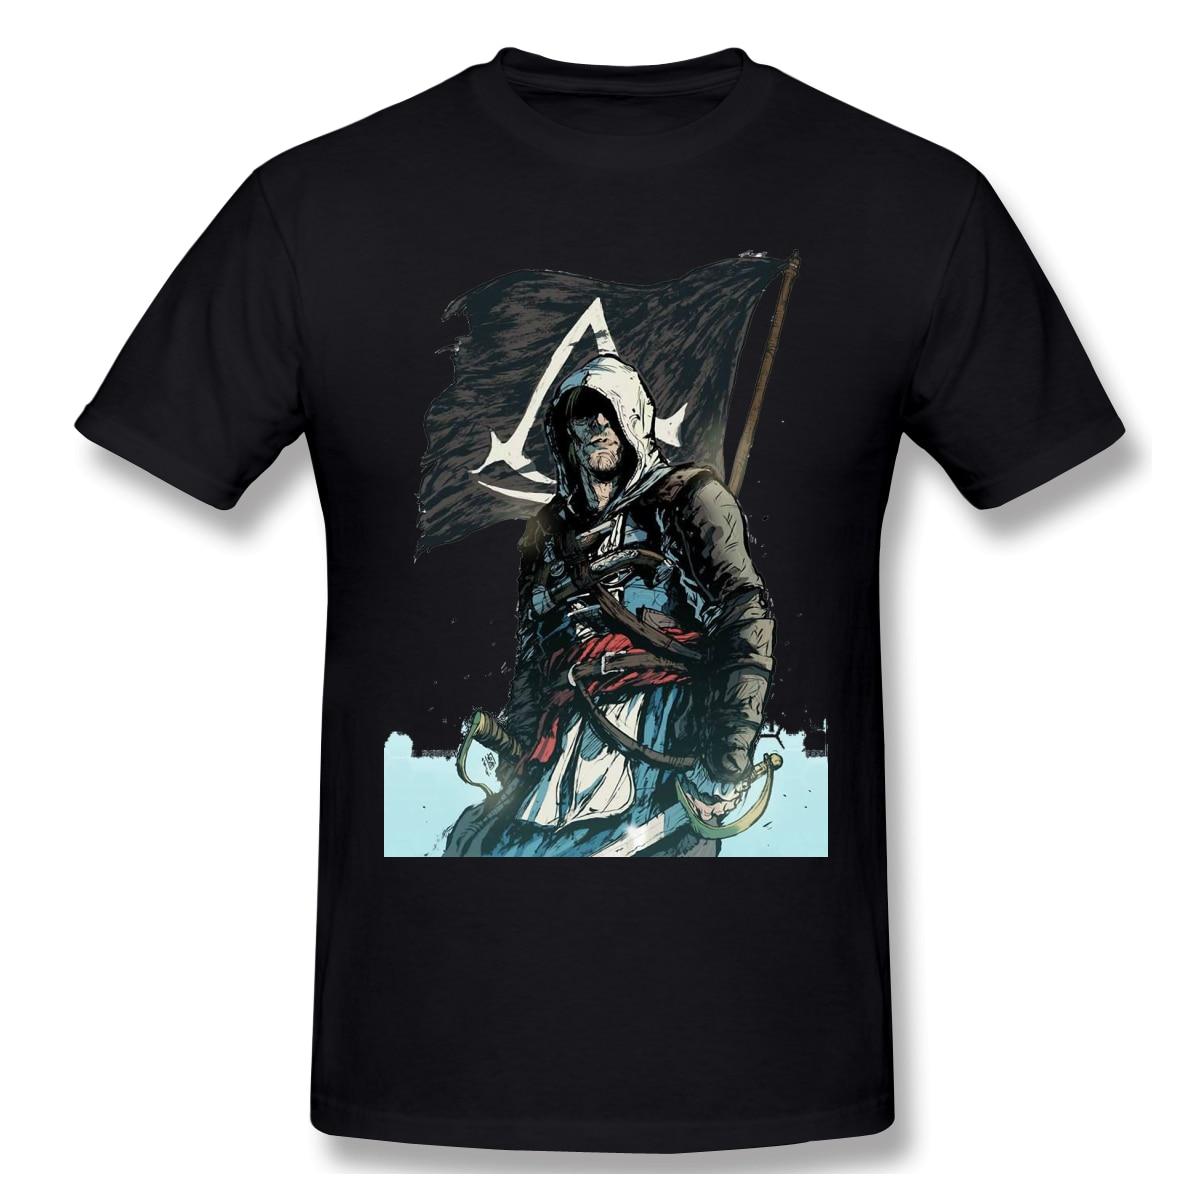 Camiseta assassins creed, camiseta roja, negro, Cool para hombre, moda, manga corta